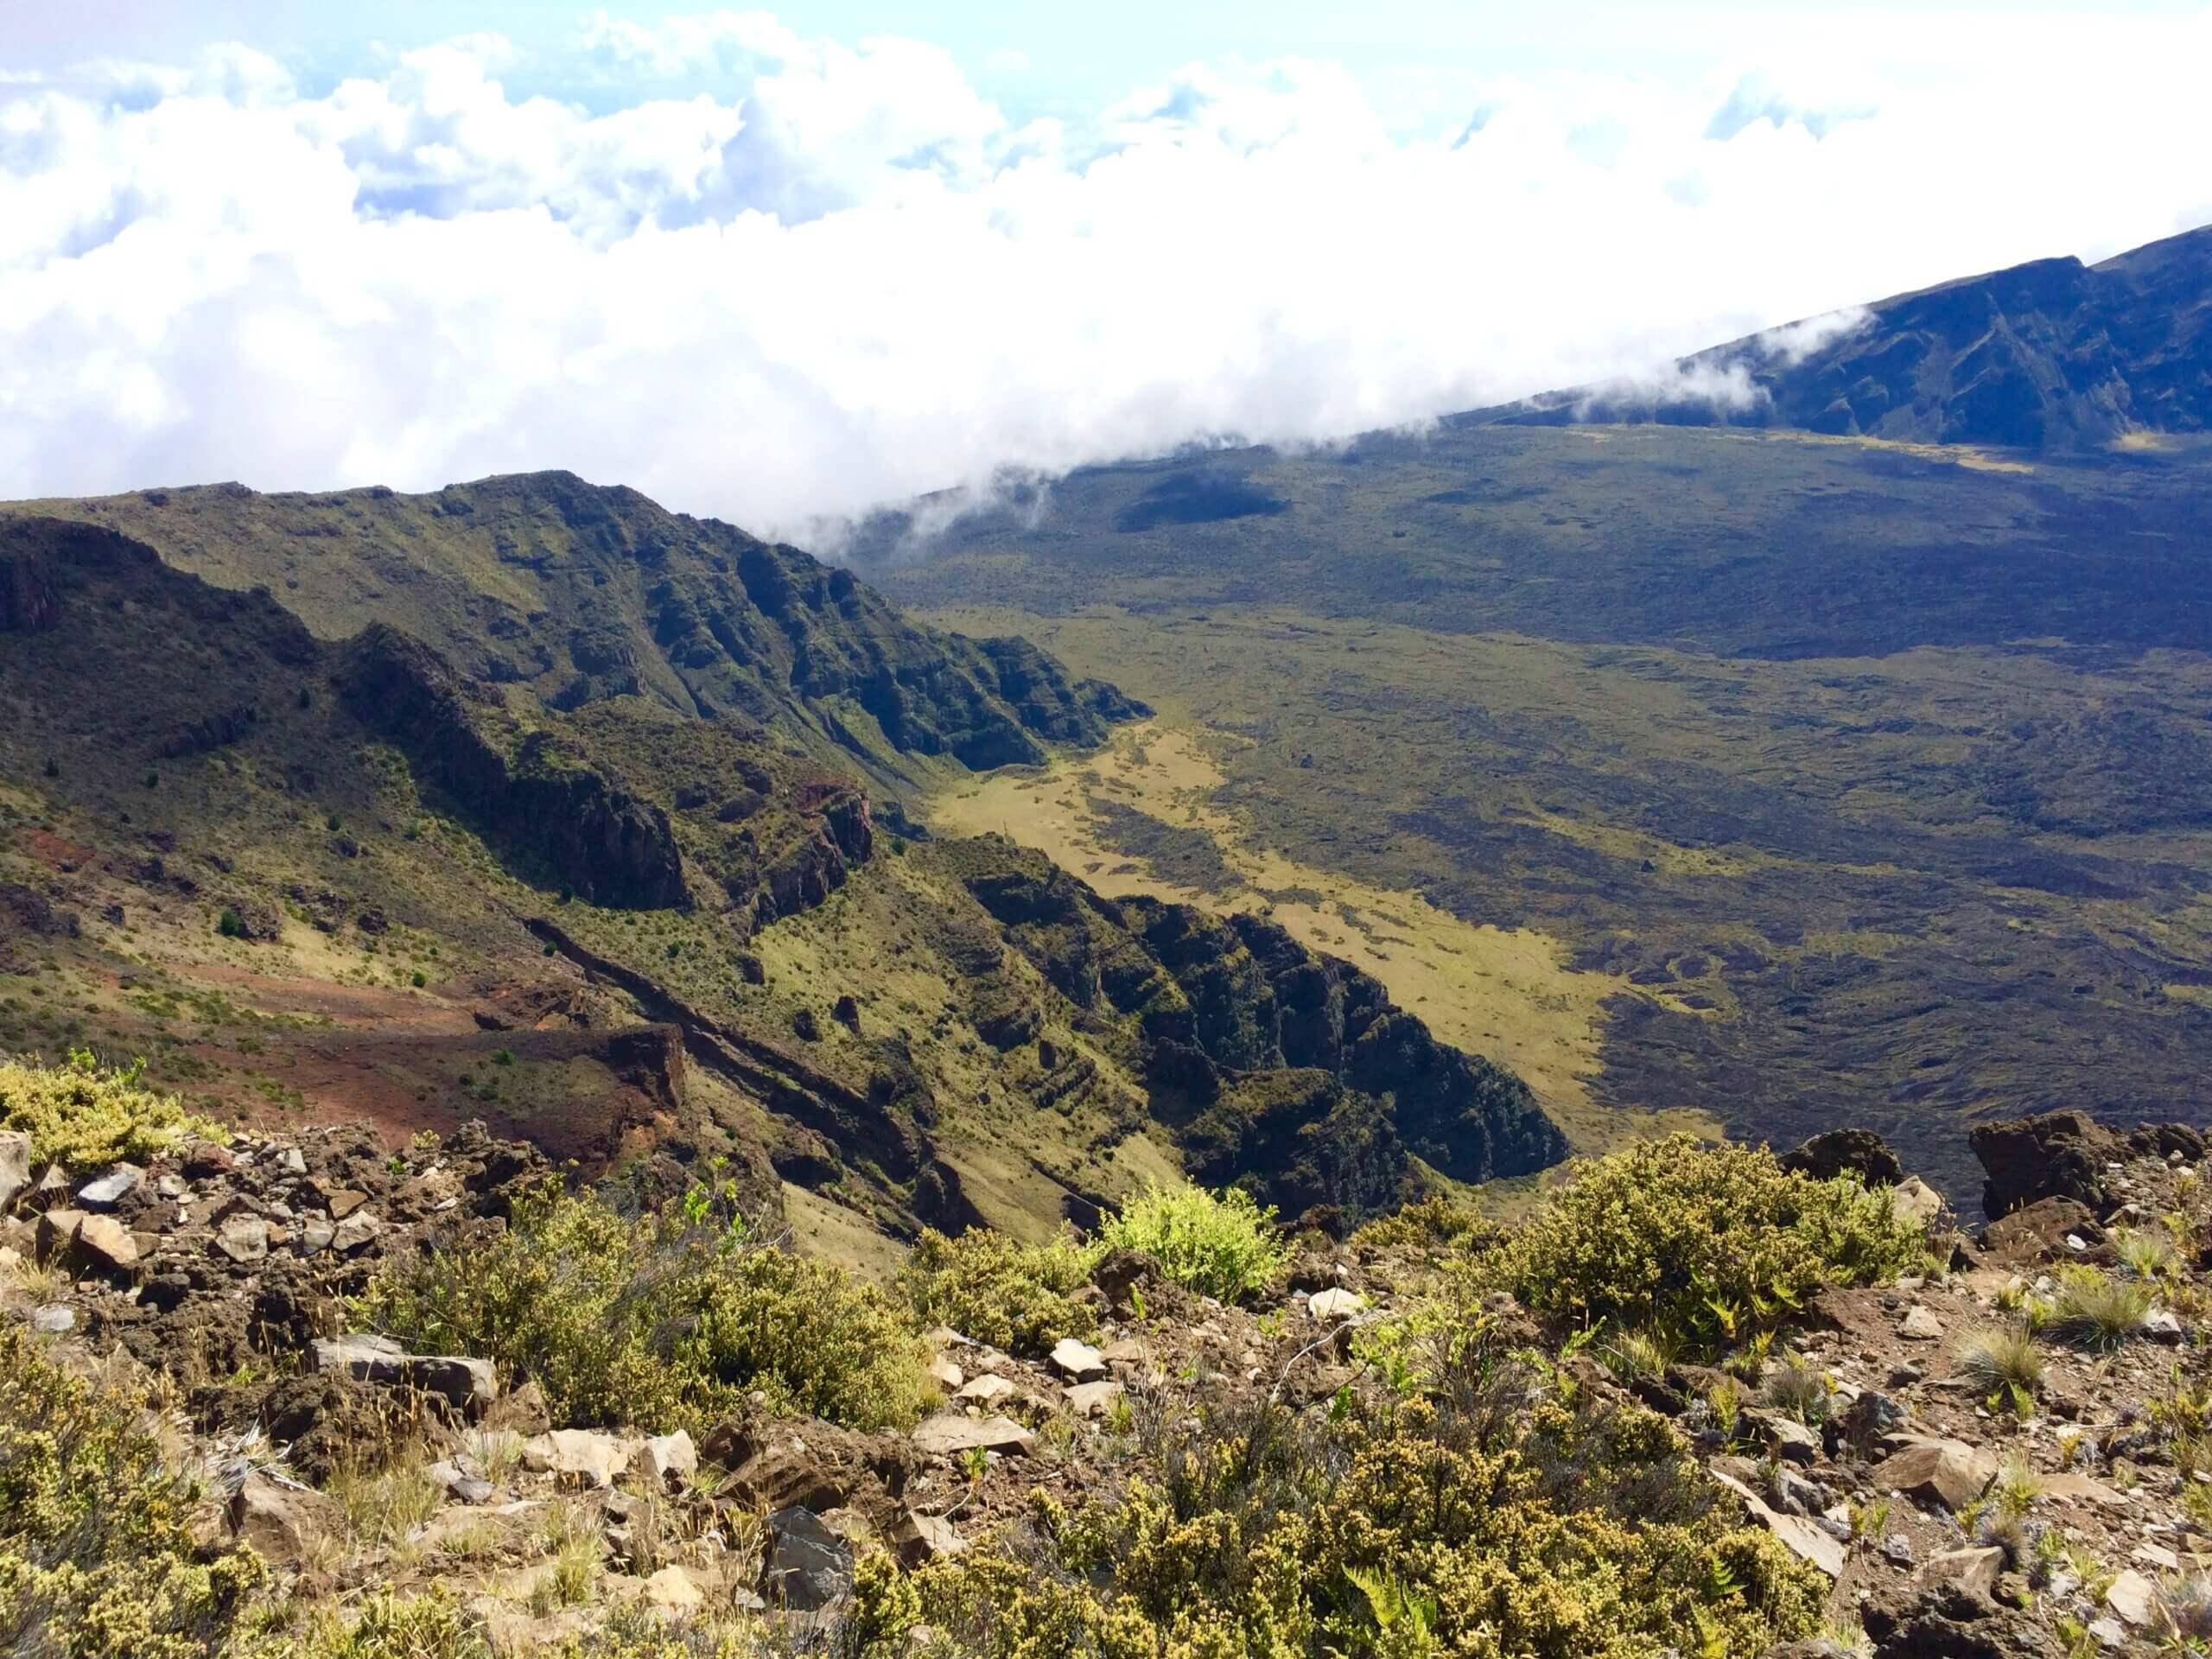 rocky and green visit near Mount Haleakala